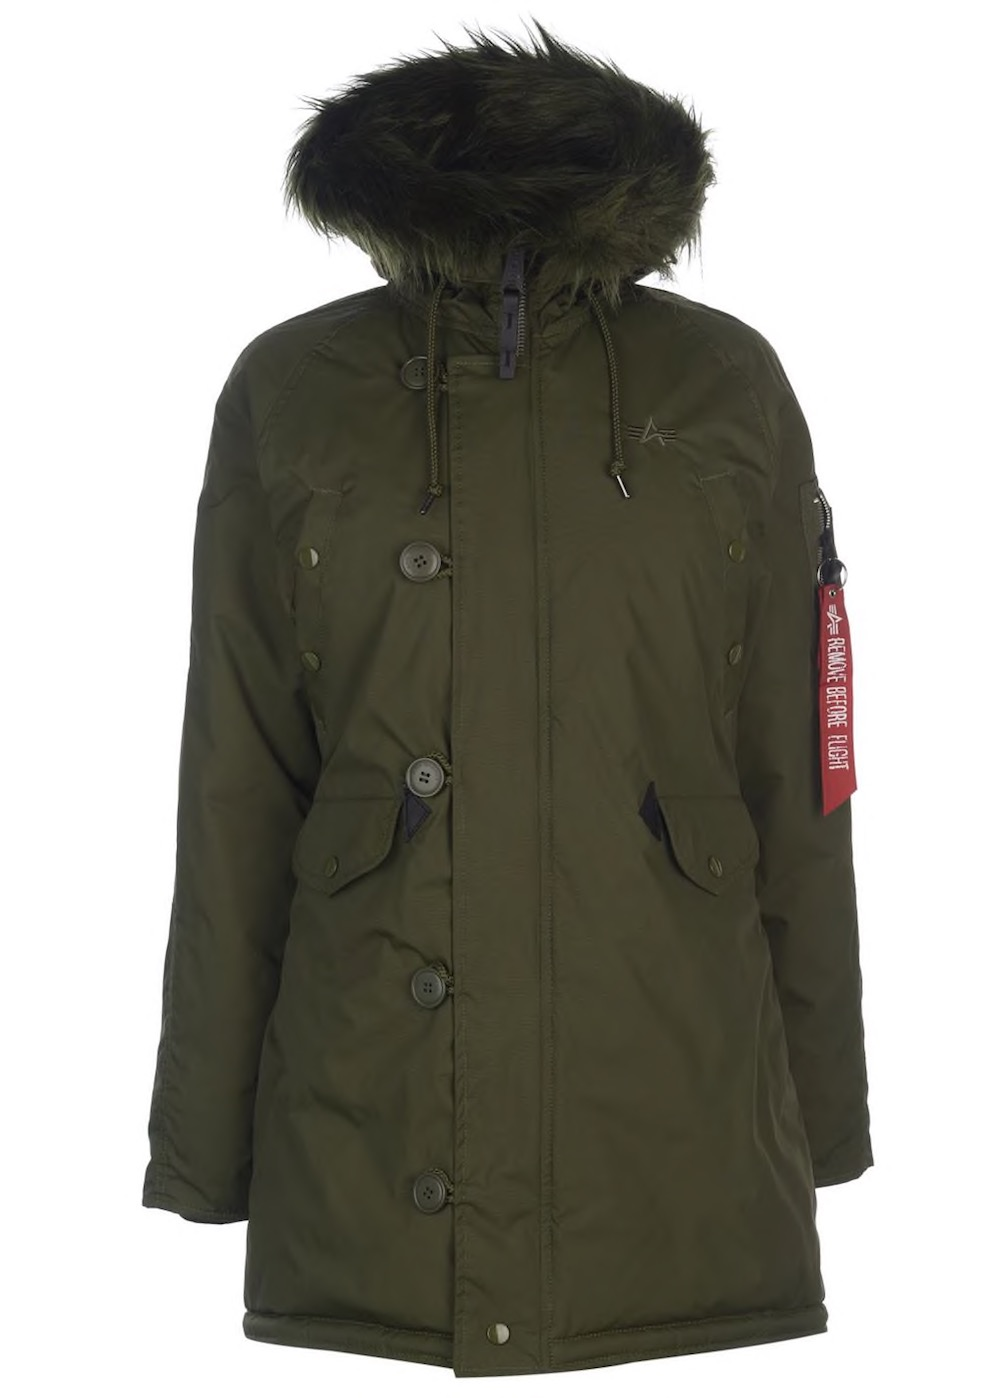 Alpha Industries Damen Jacke N3B VF 59 Wmn Winterjacke Parka Coat XS bis XXL NEU